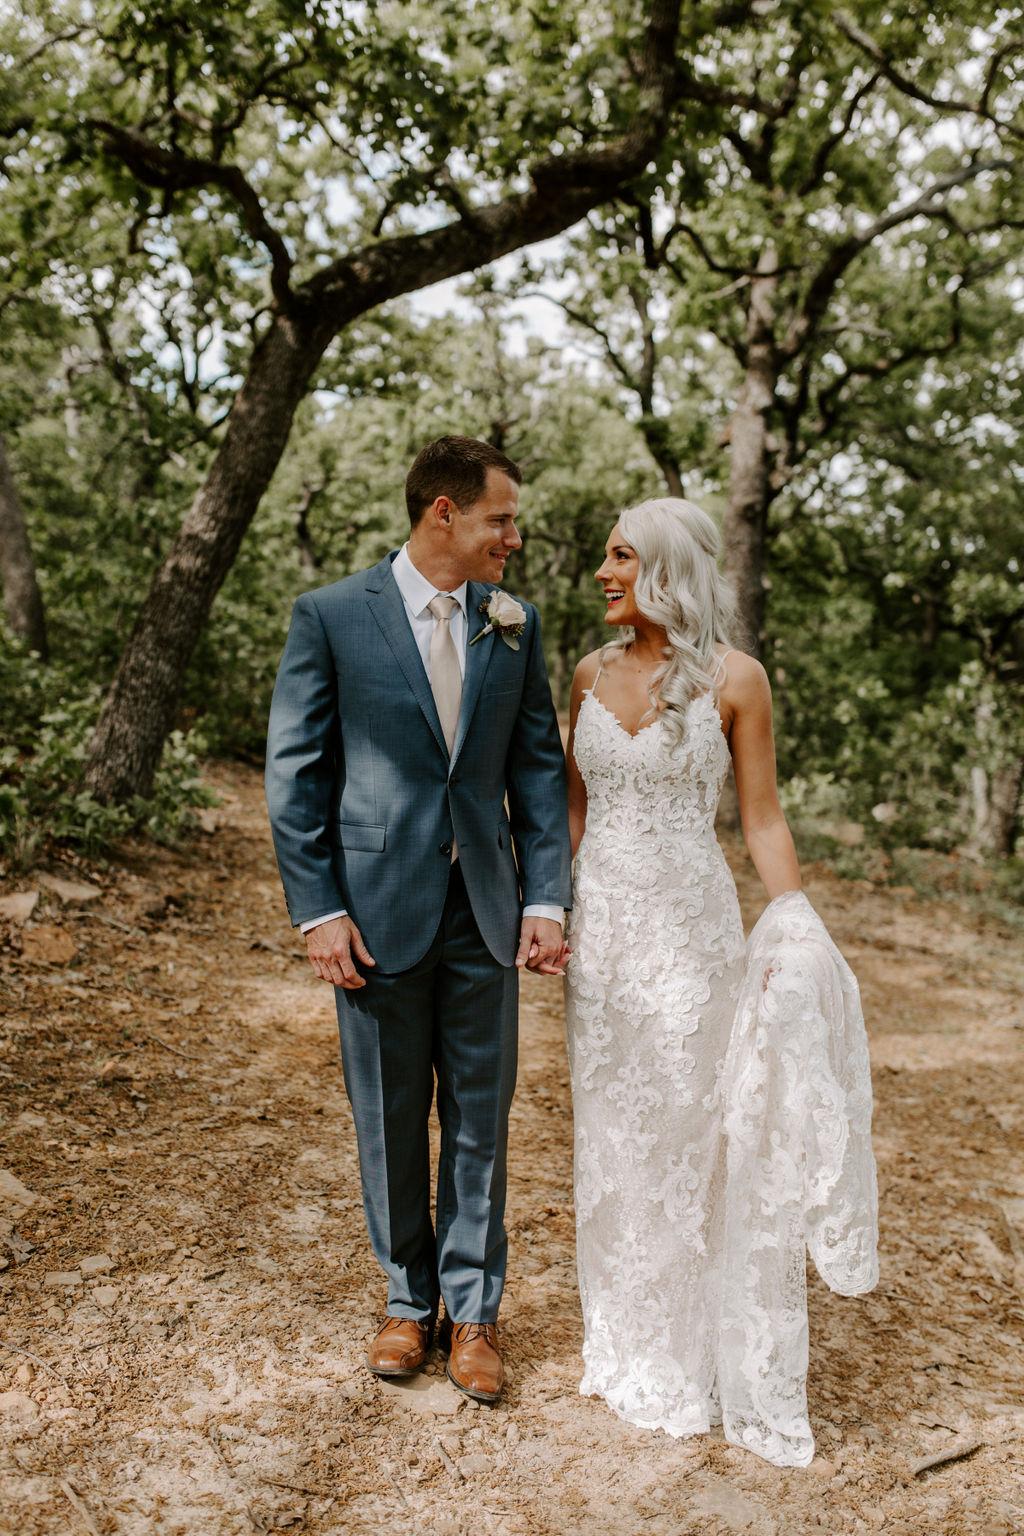 Best Oklahoma Outdoor Wedding Venue Tulsa Bixby White Barn 20.jpg